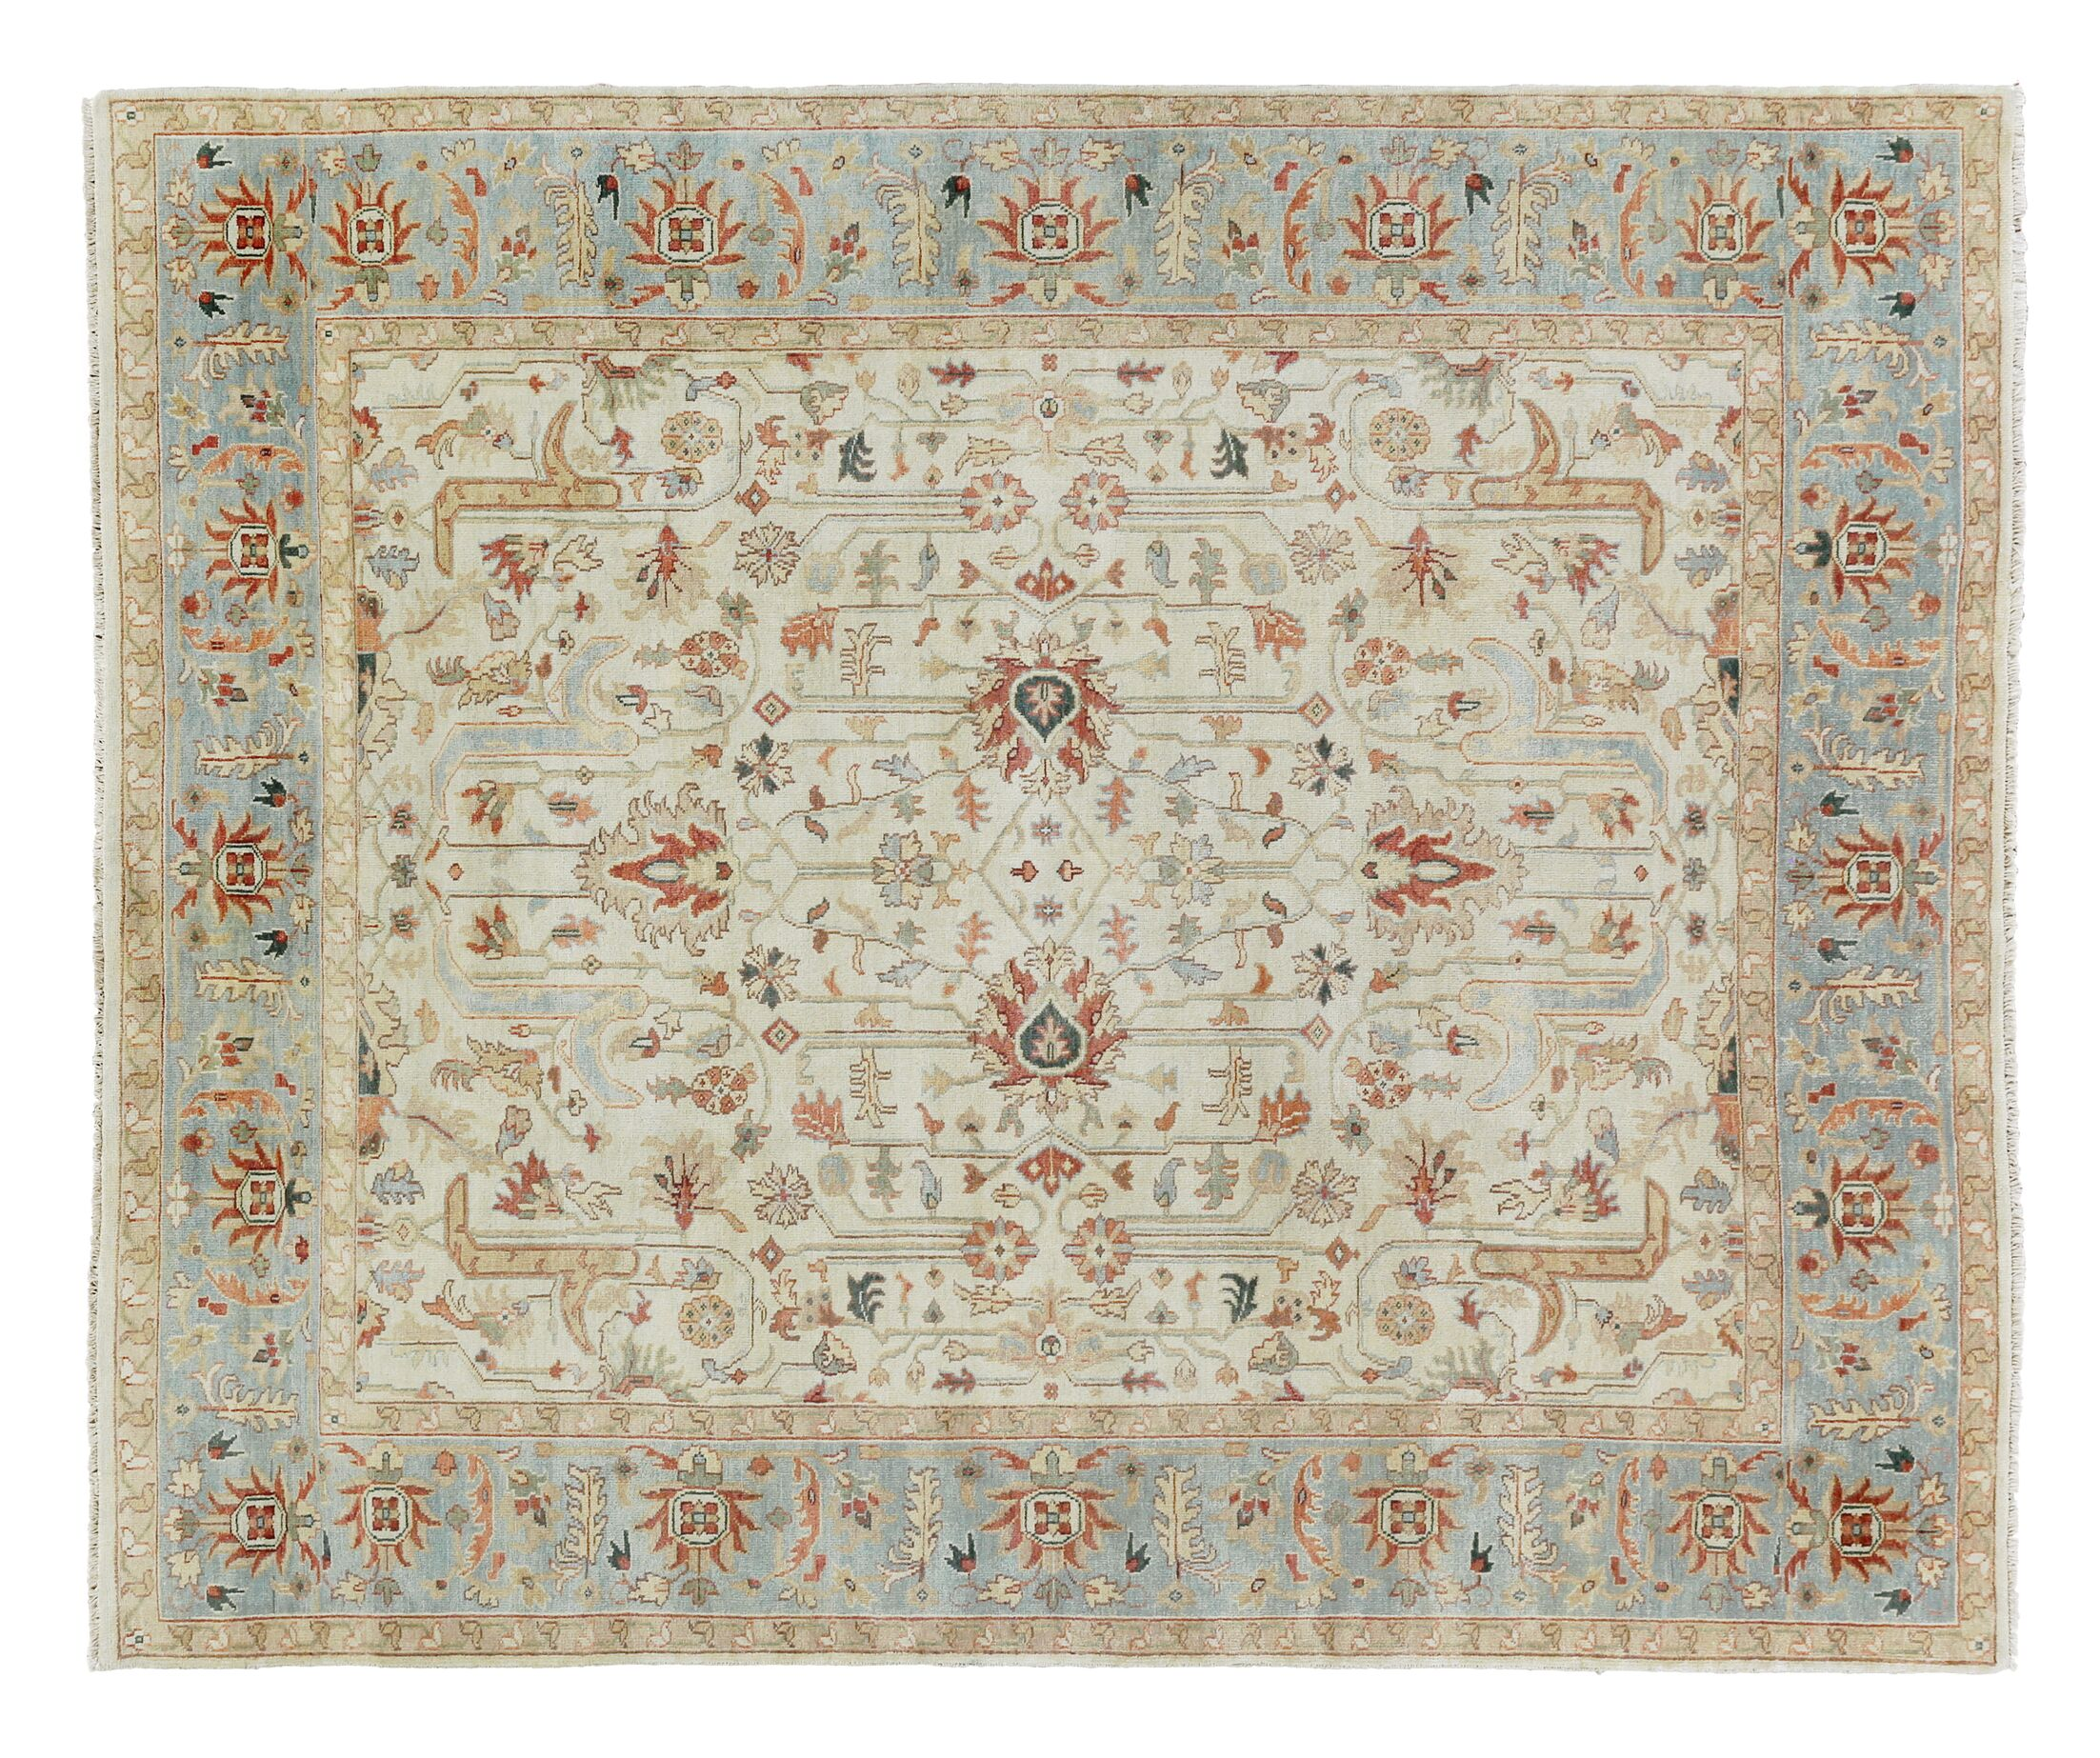 Serapi Hand-Knotted Wool Ivory/Light Blue Area Rug Rug Size: Rectangle 14' x 18'